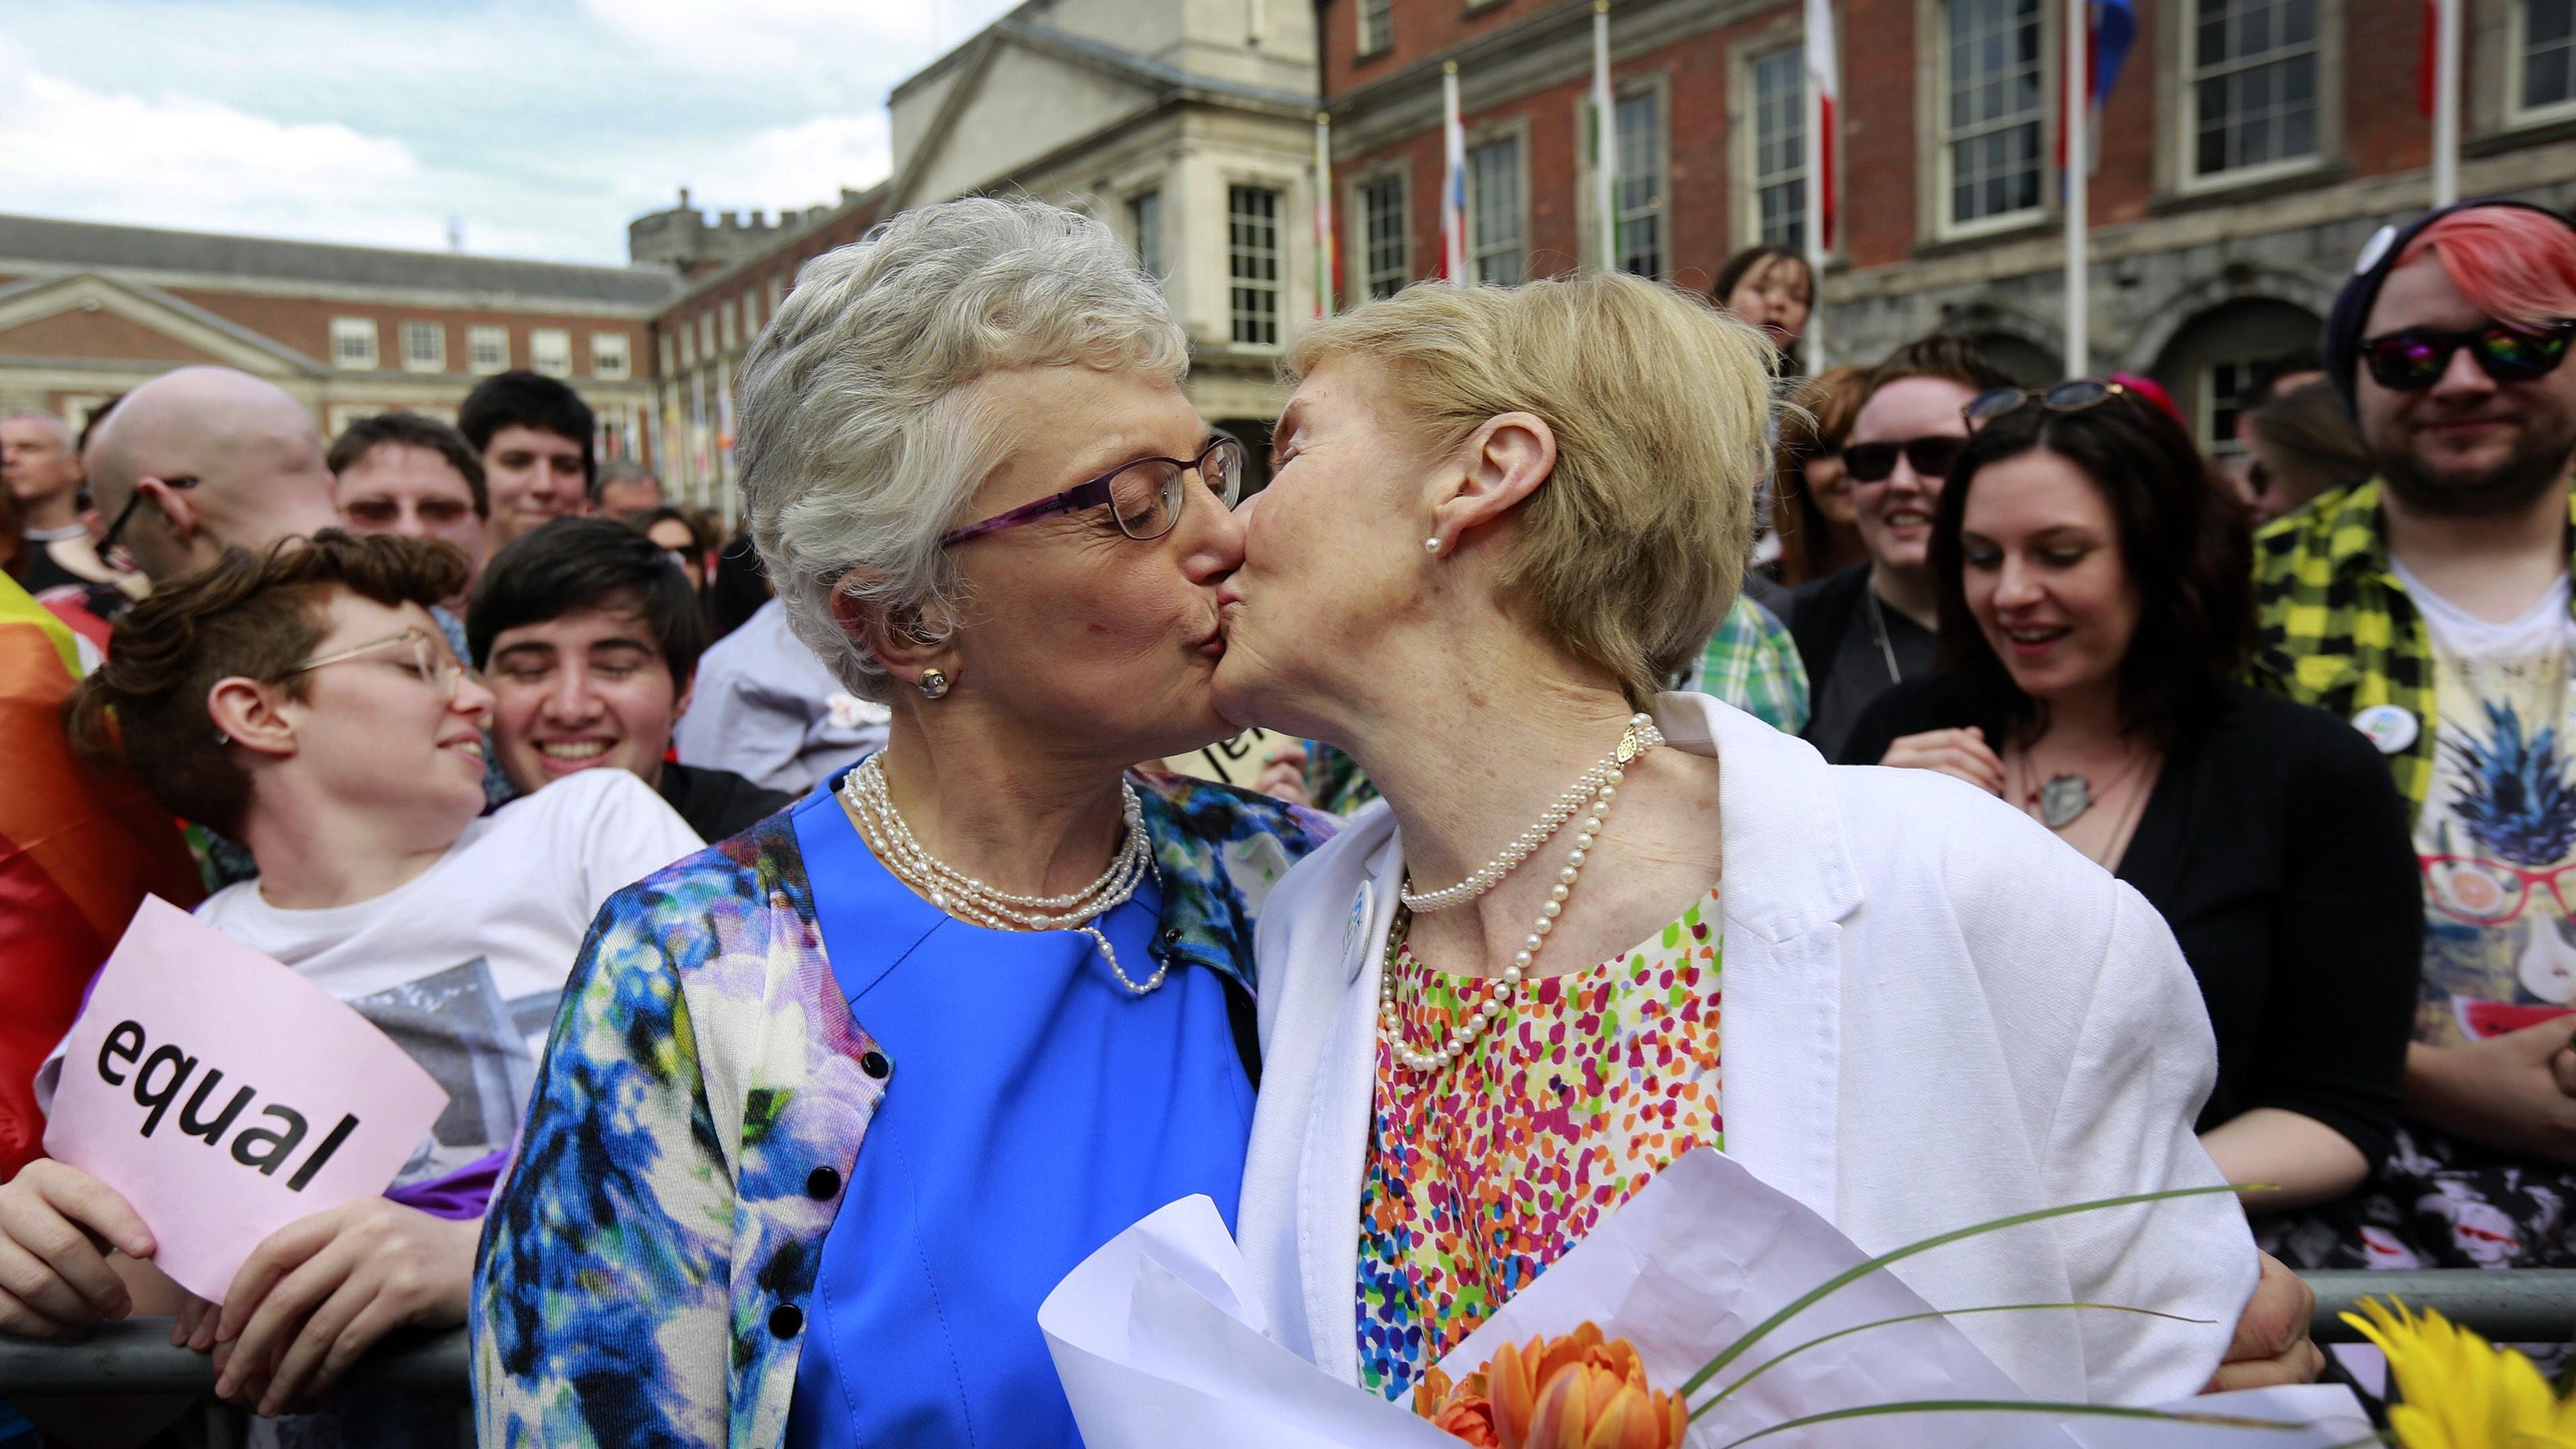 Ireland same-sex marriage